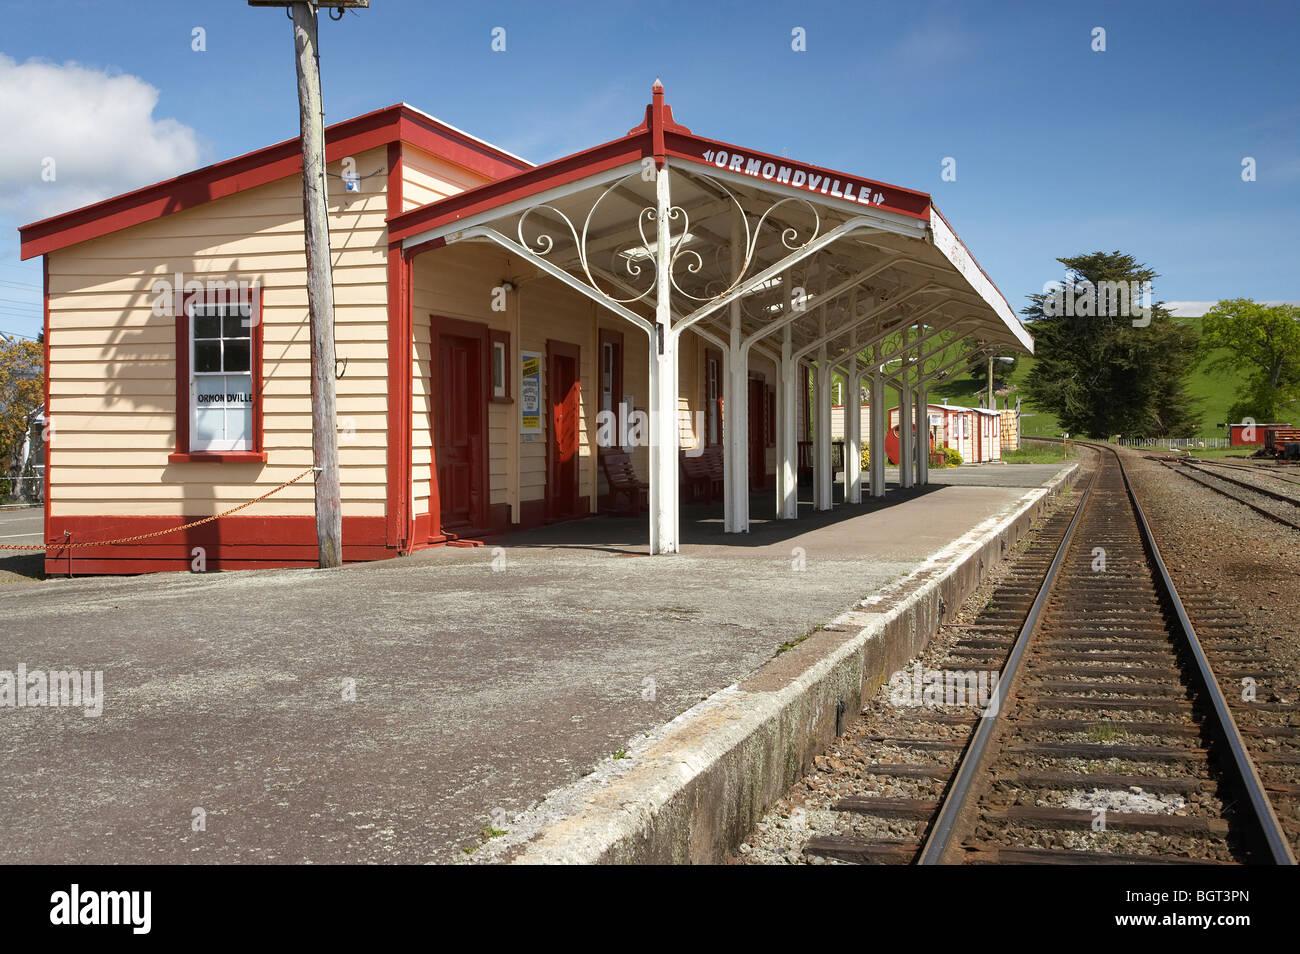 Historic Railway Station, Ormondville, Tararua District, Wairarapa, North Island, New Zealand - Stock Image